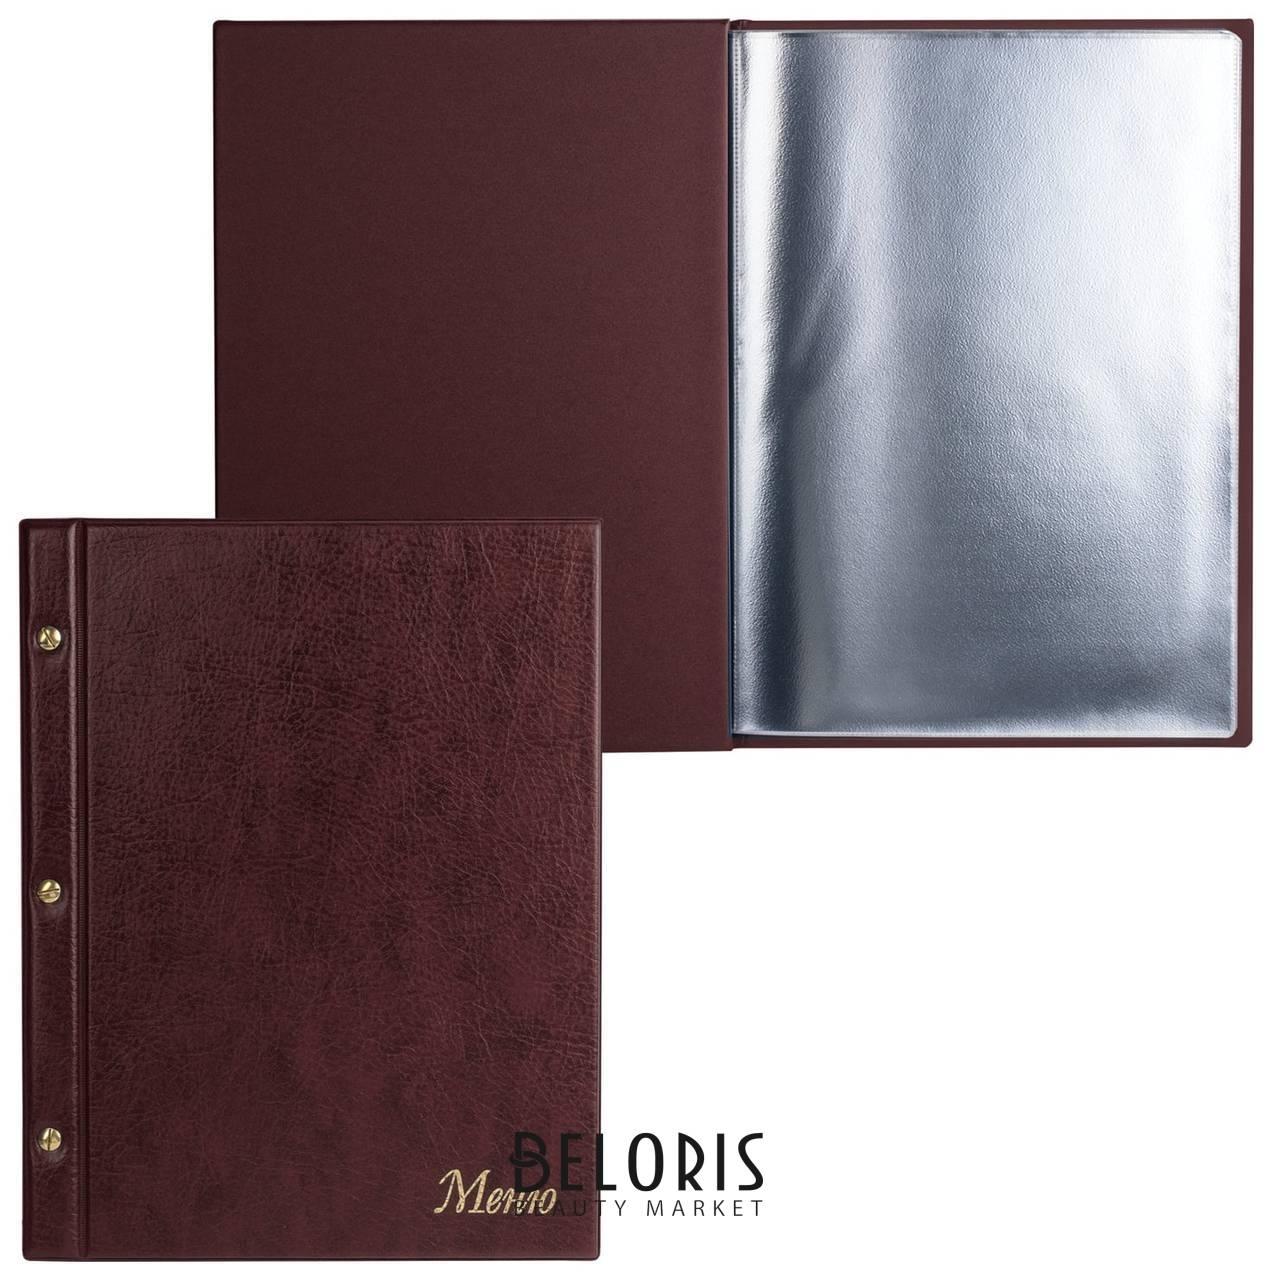 Папка Менюна трех винтах, с 10 файлами, 220х320 мм, коричневая,ДПС Dps Kanc